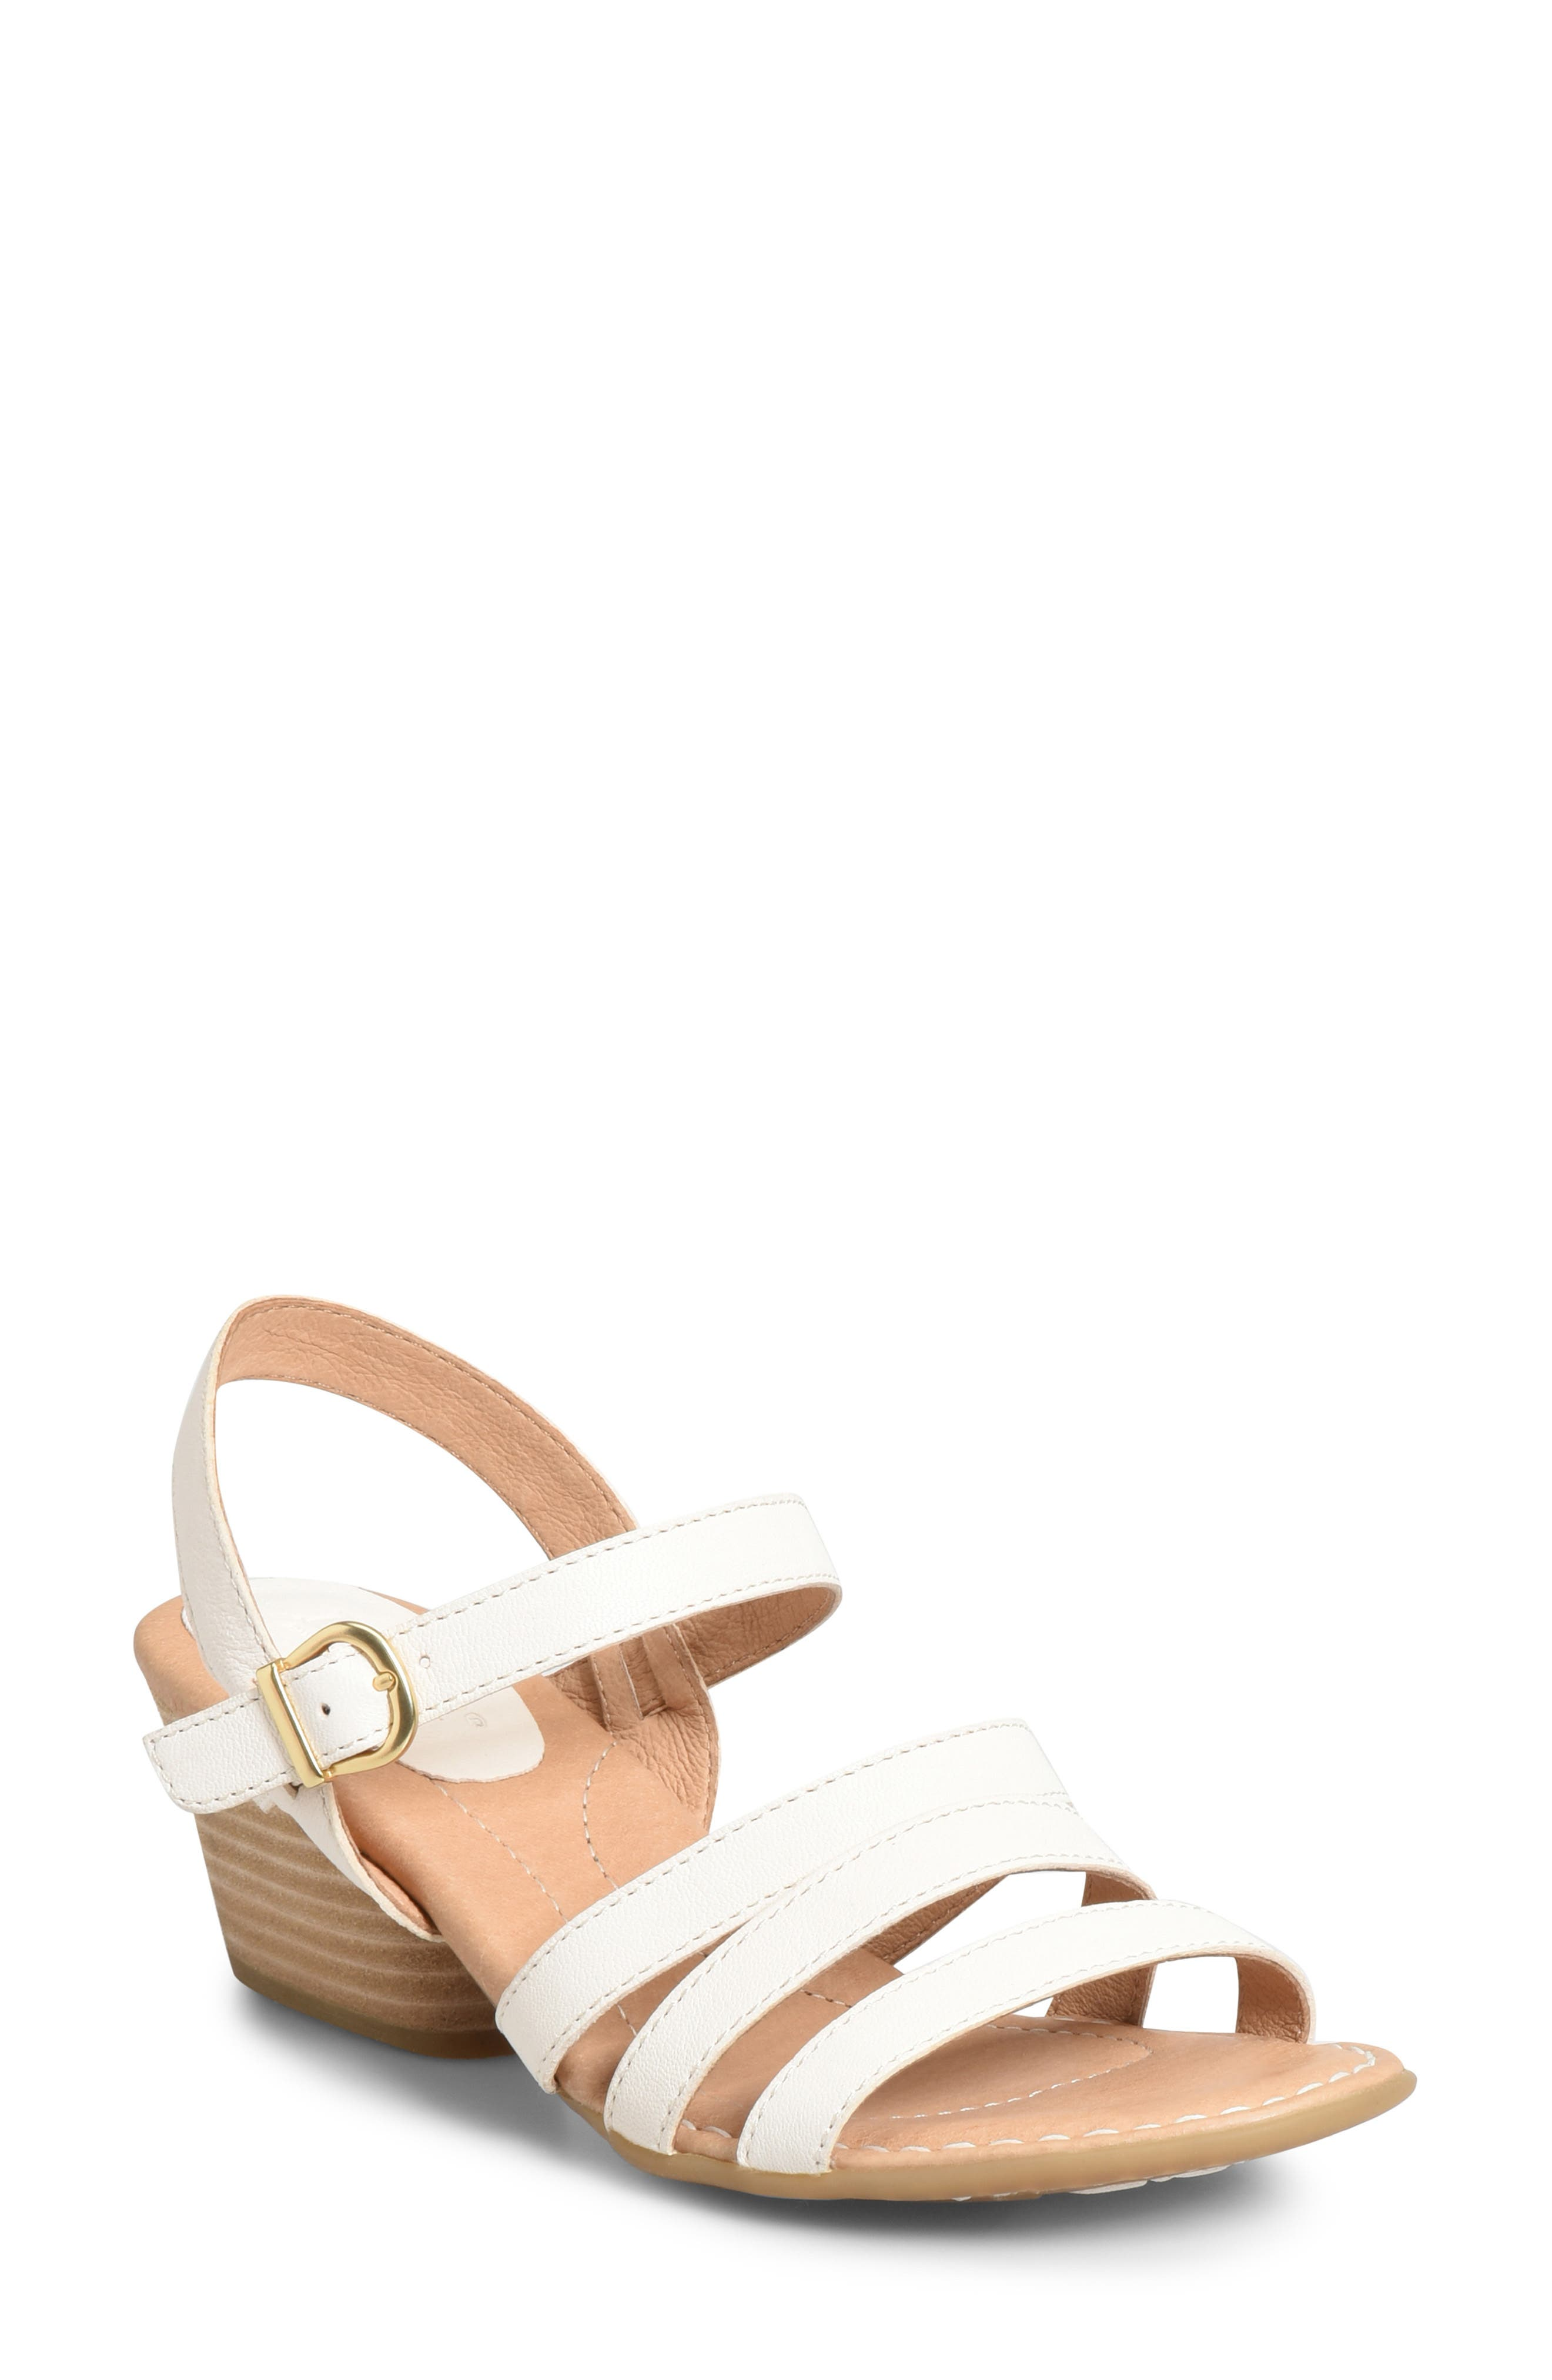 B?rn Lasal Sandal, White